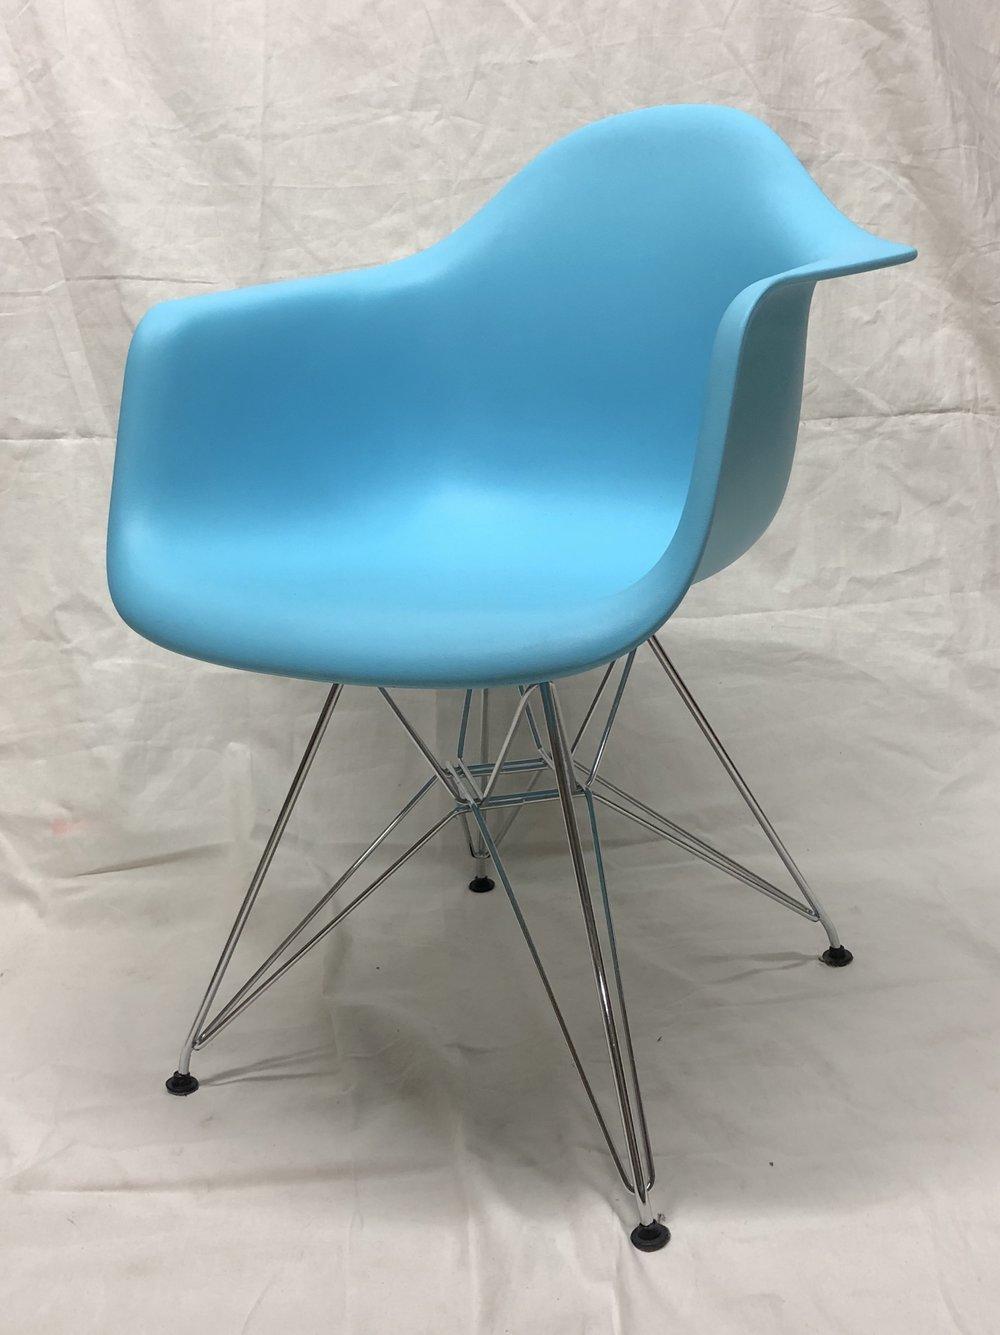 Molded Plastic Arm Chair - $25